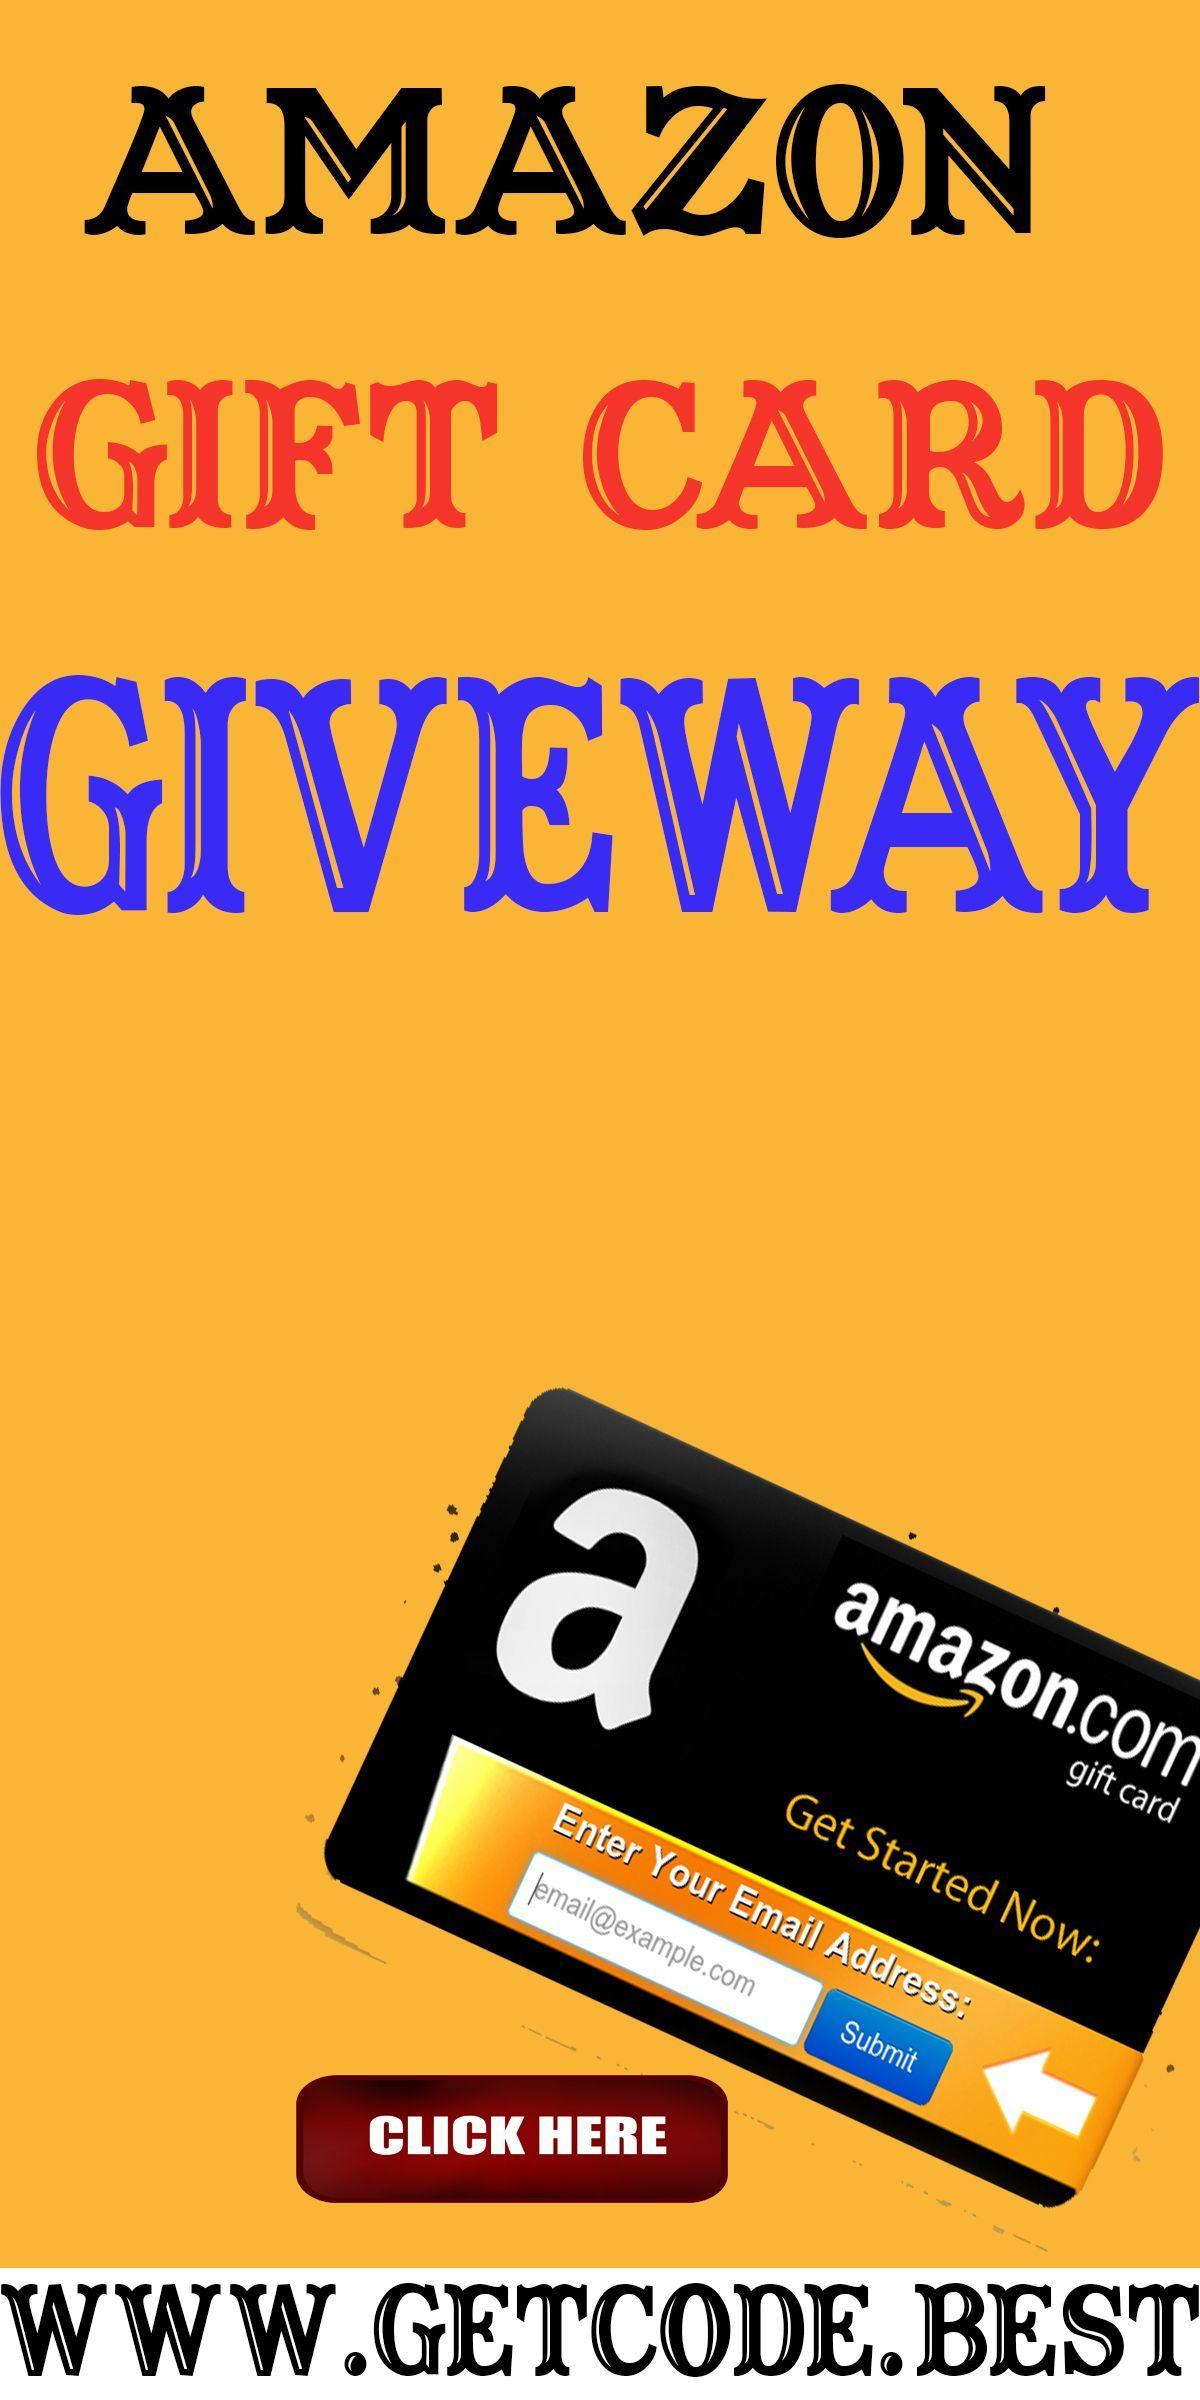 How To Get Free Amazon Gift Card Amazon Gift Card Free Amazon Gift Cards Amazon Gifts